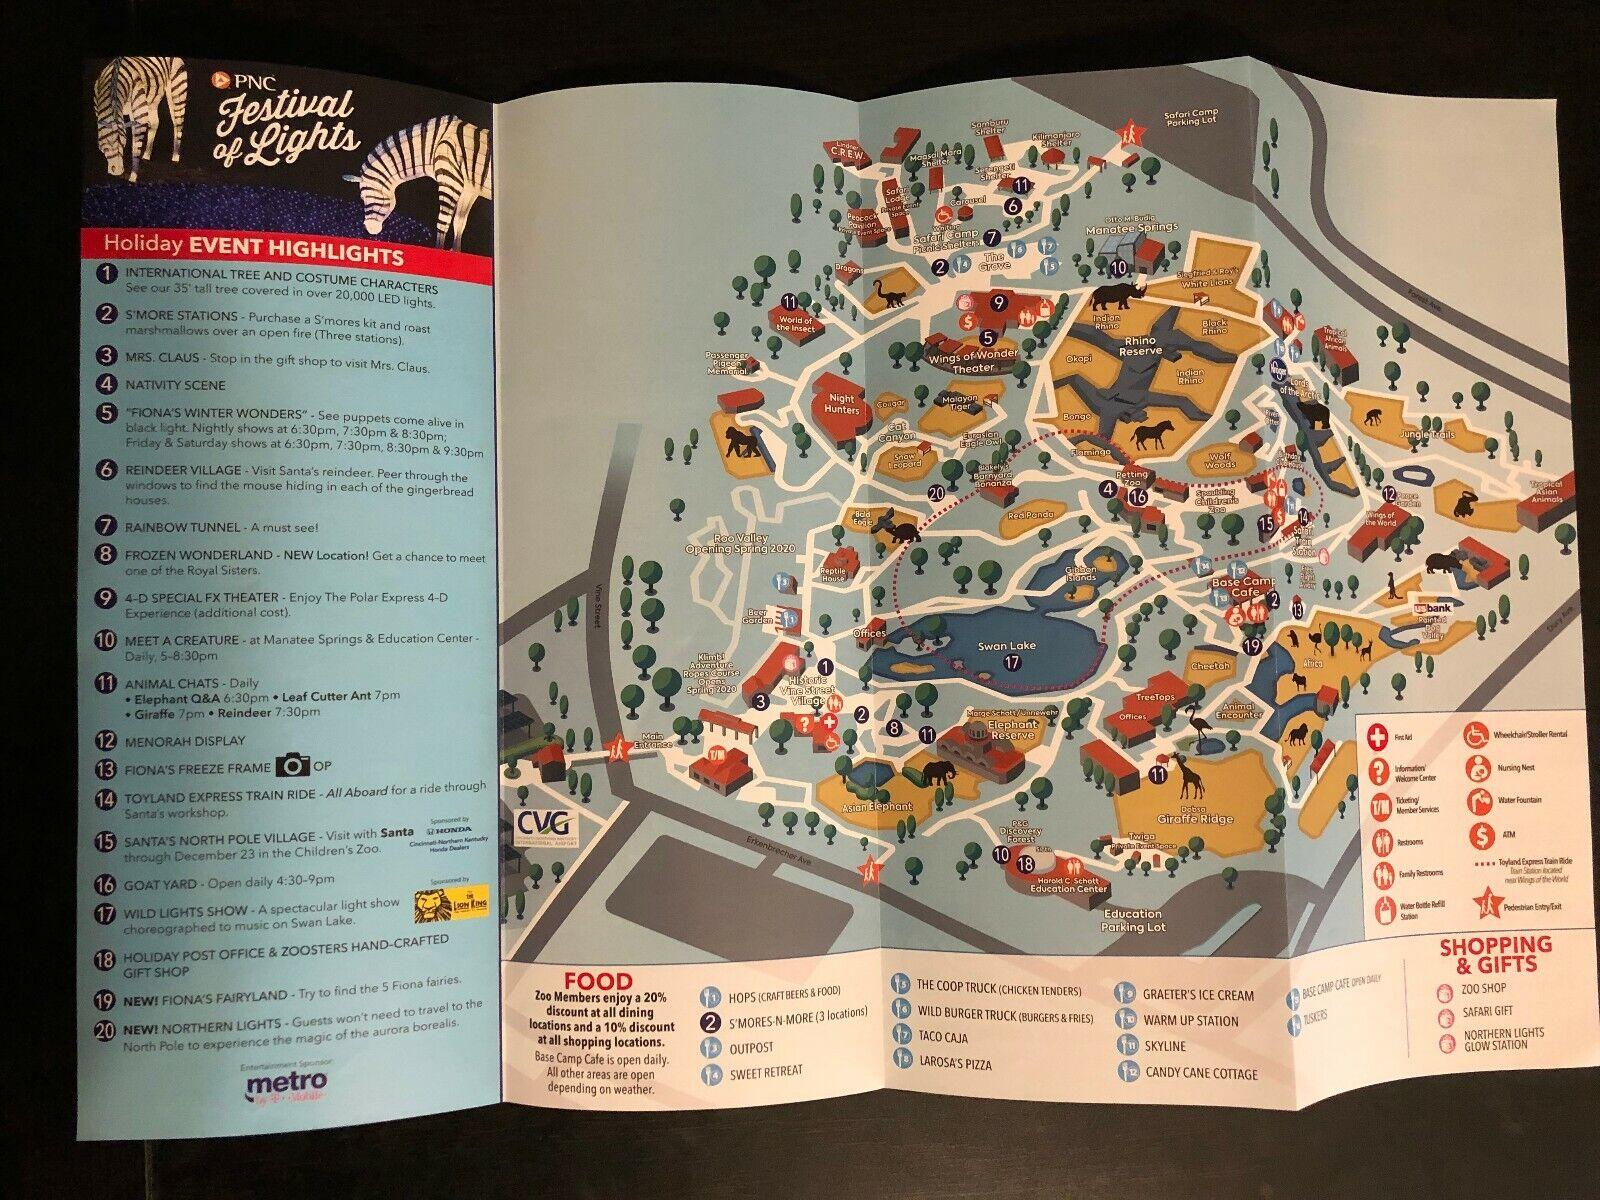 2019 2020 Cincinnati Zoo Festival Of Lights Park Map Official OHIO Christmas - $4.99